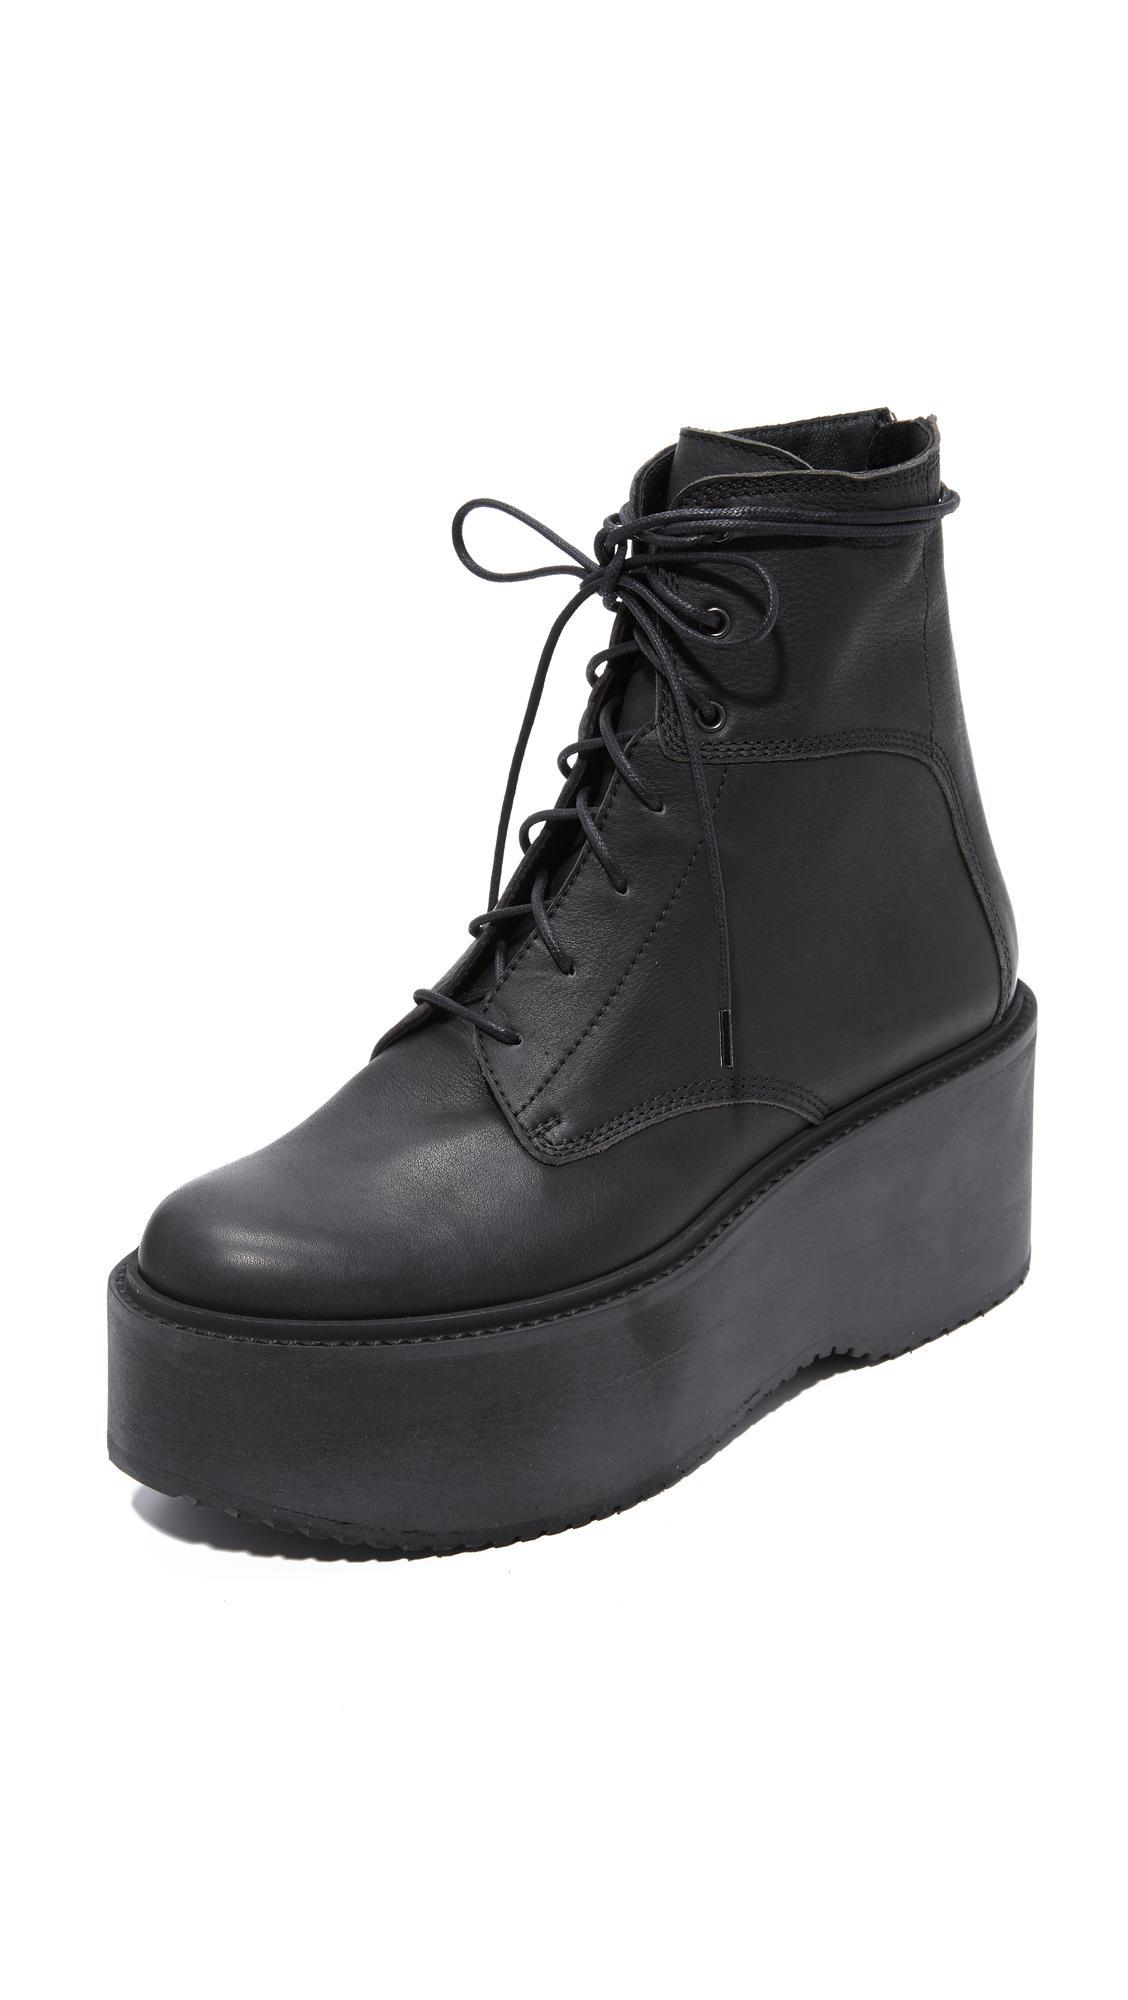 Ld Tuttle The Plunge Platform Combat Boots In Black Lyst